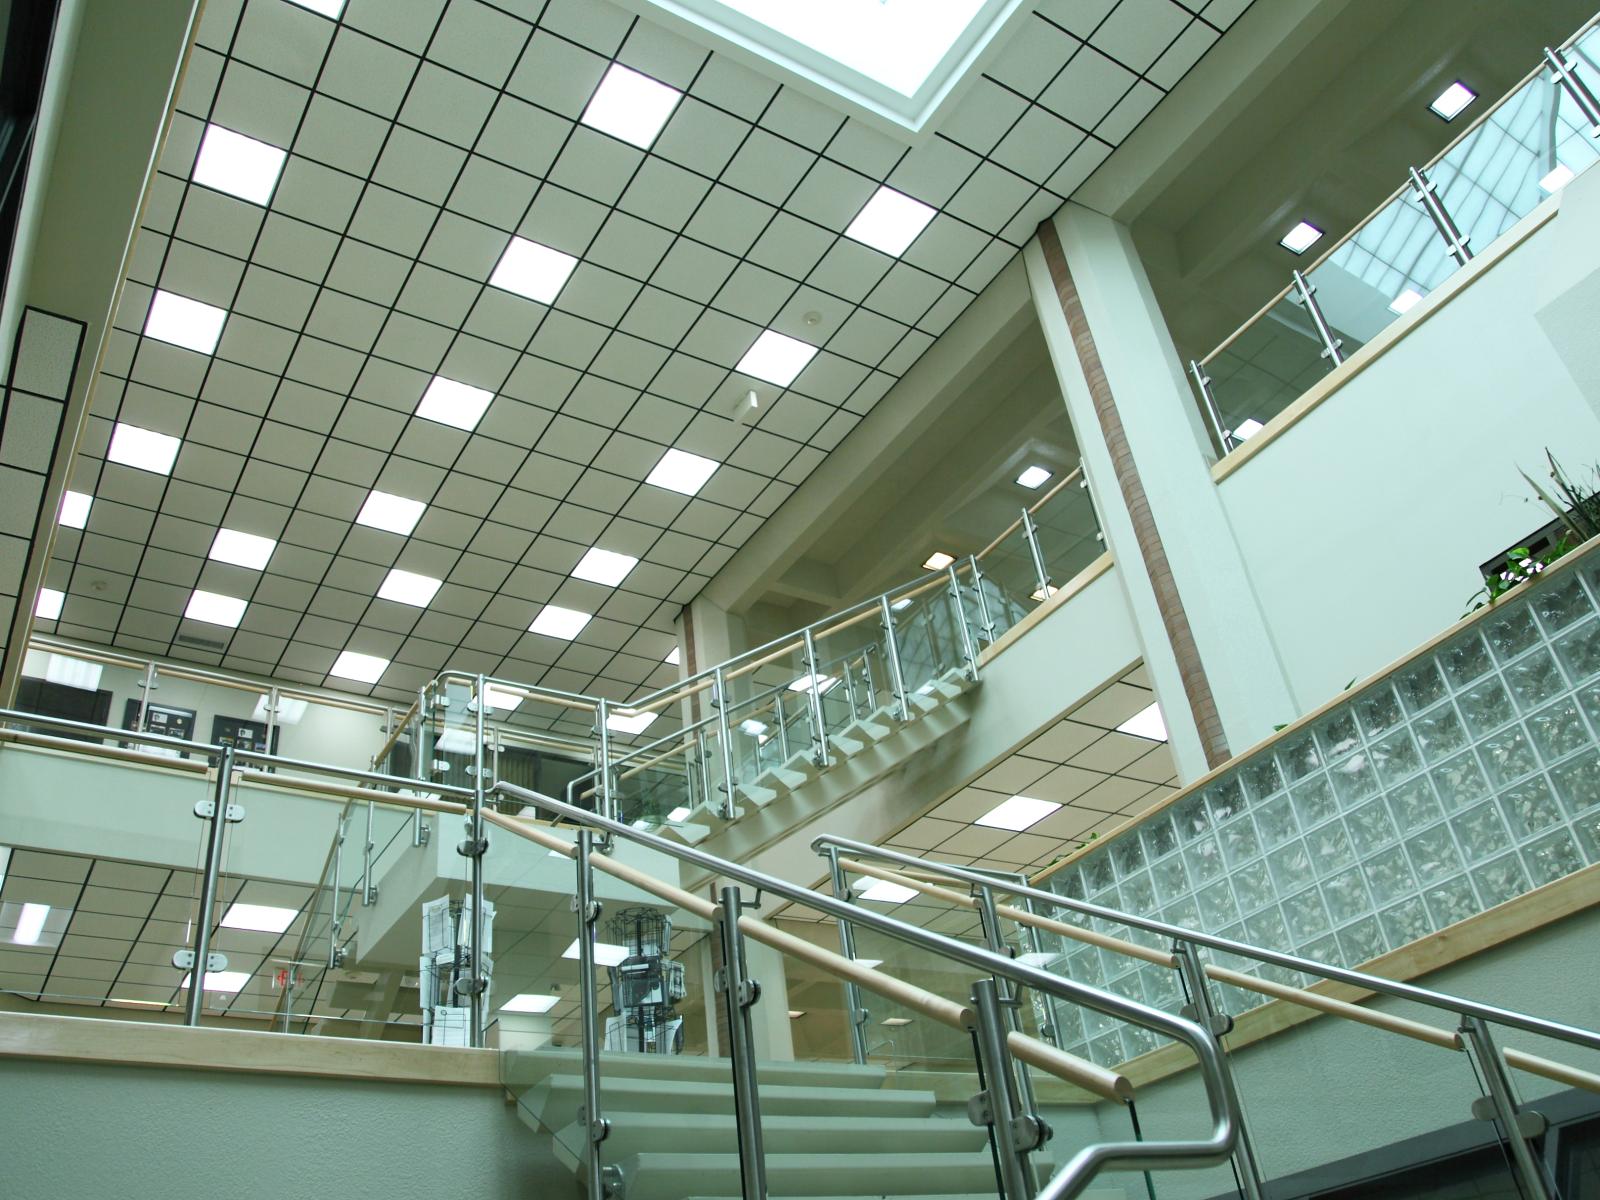 Proper Lighting Helps Companies Hire & Keep Top Employees